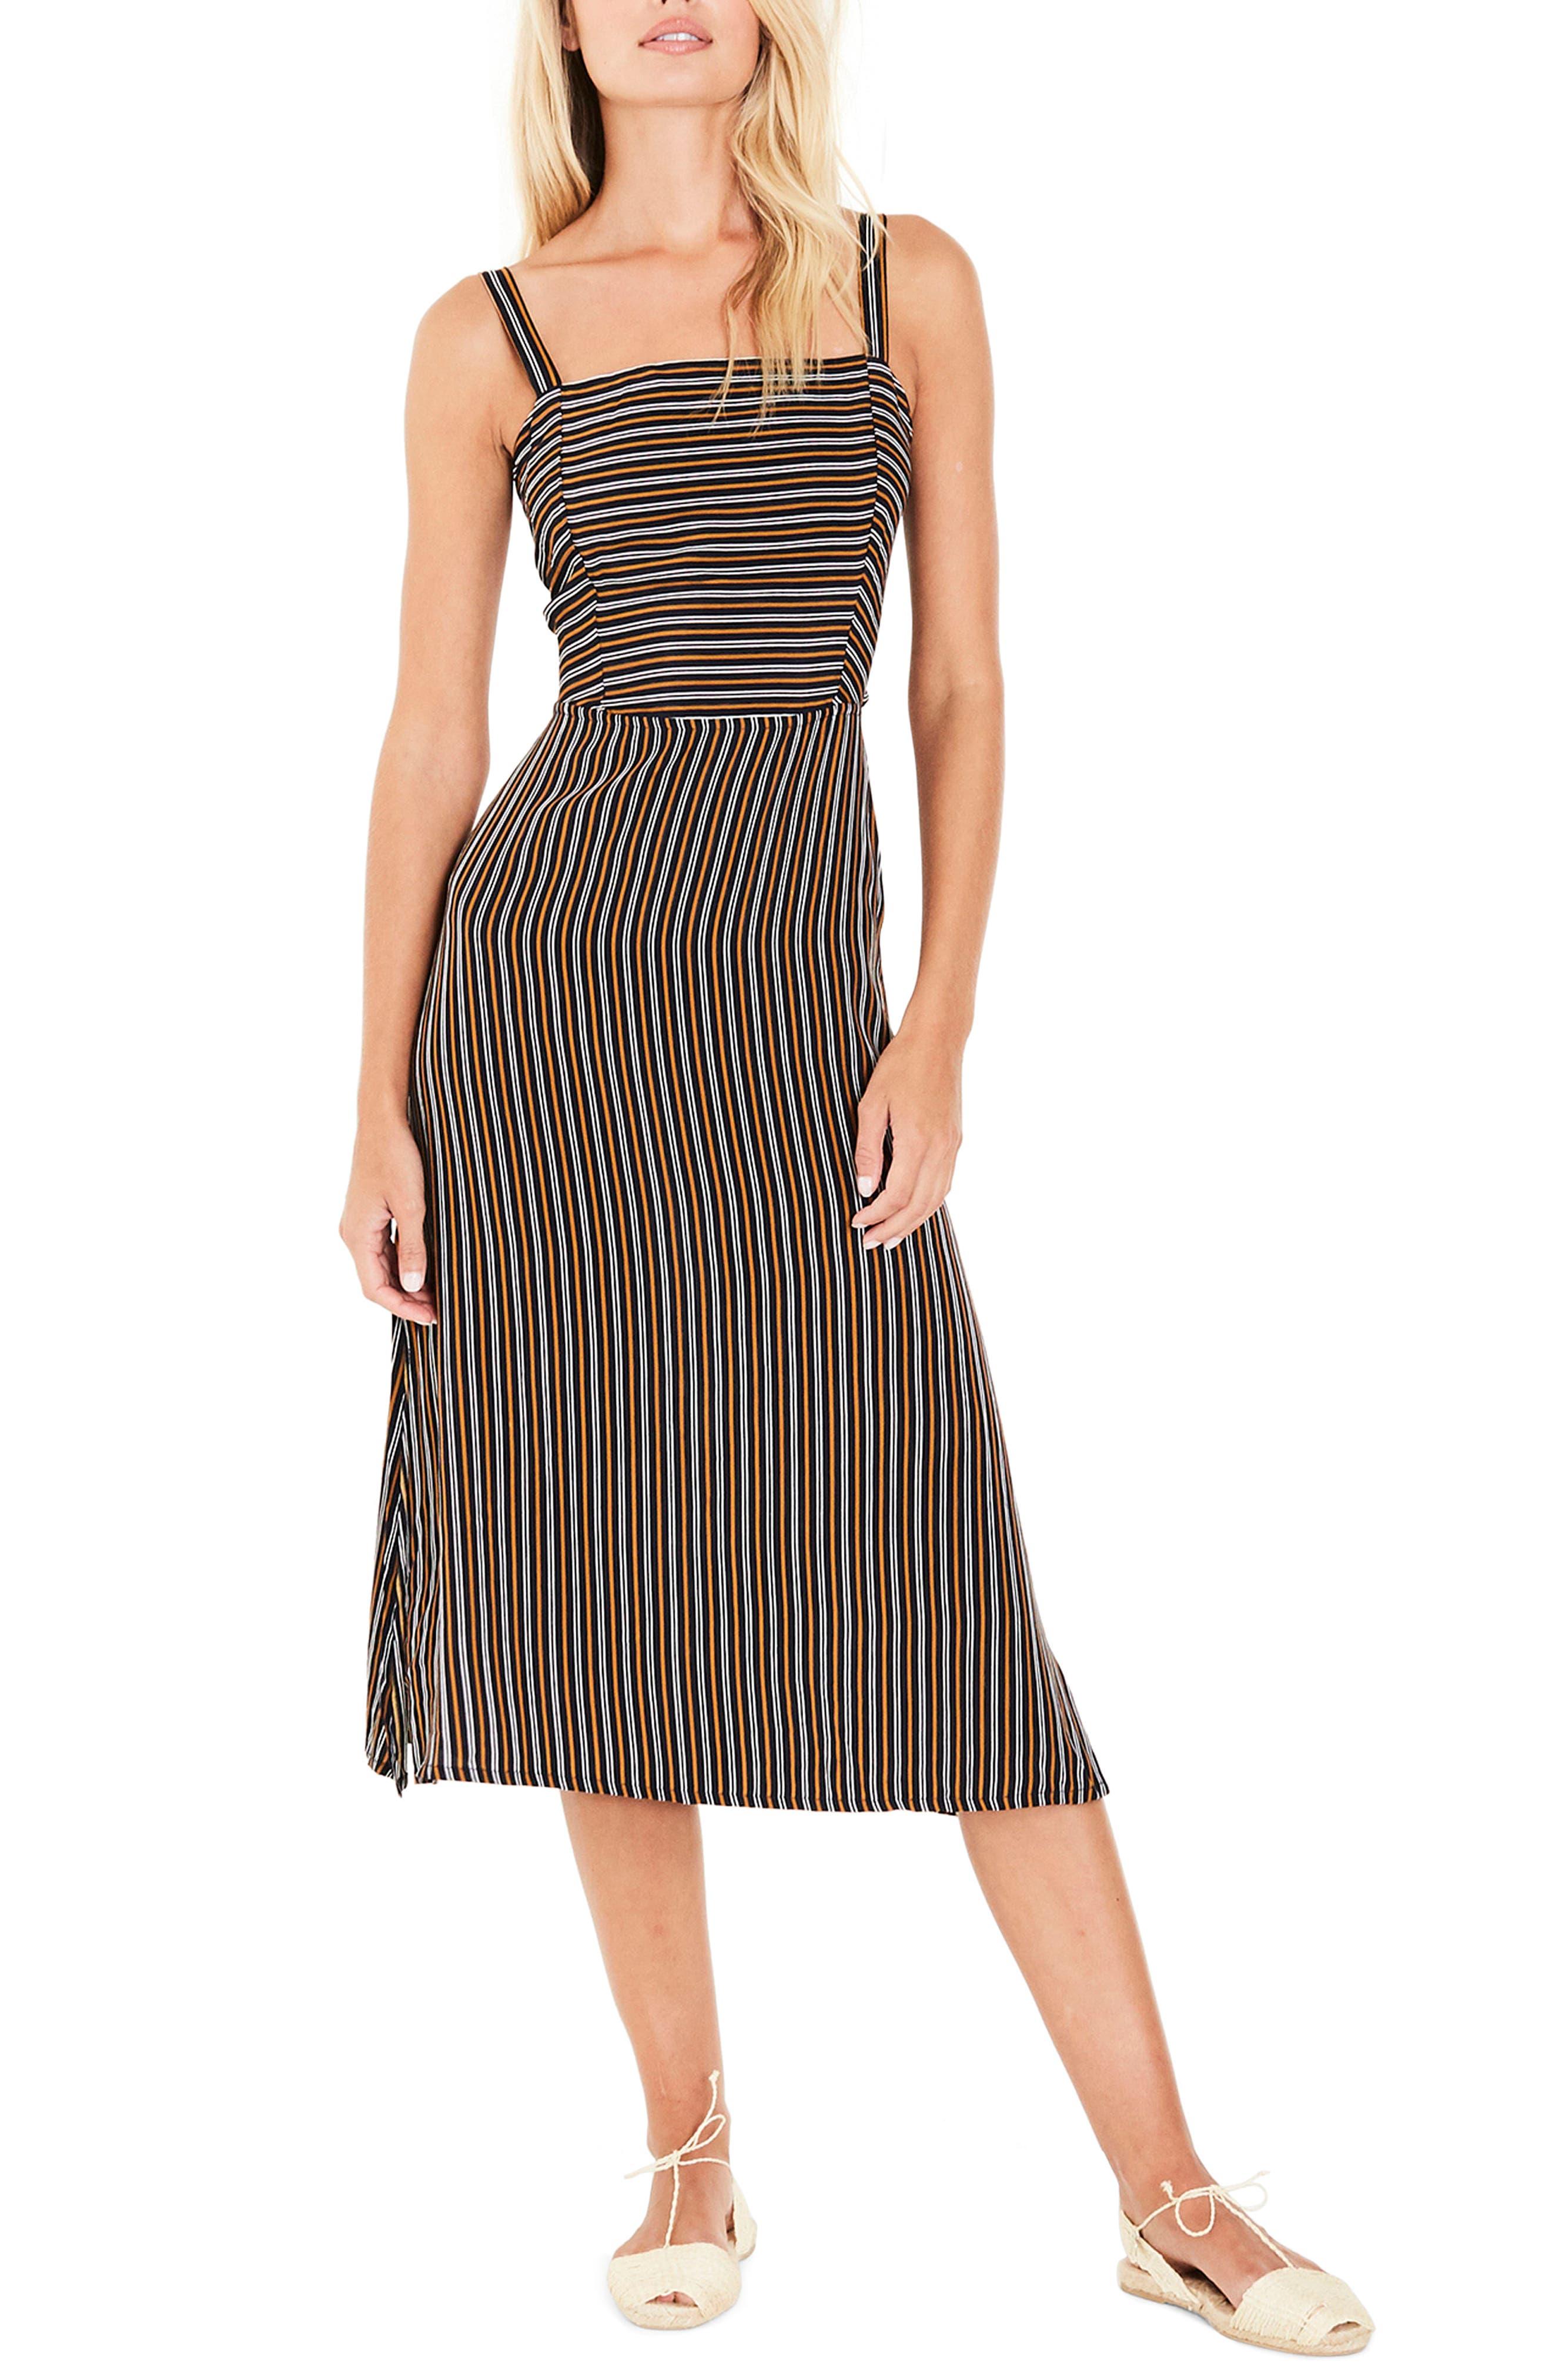 Katergo Stripe Tie Back Midi Dress,                             Main thumbnail 1, color,                             Glasgow Stripe Print